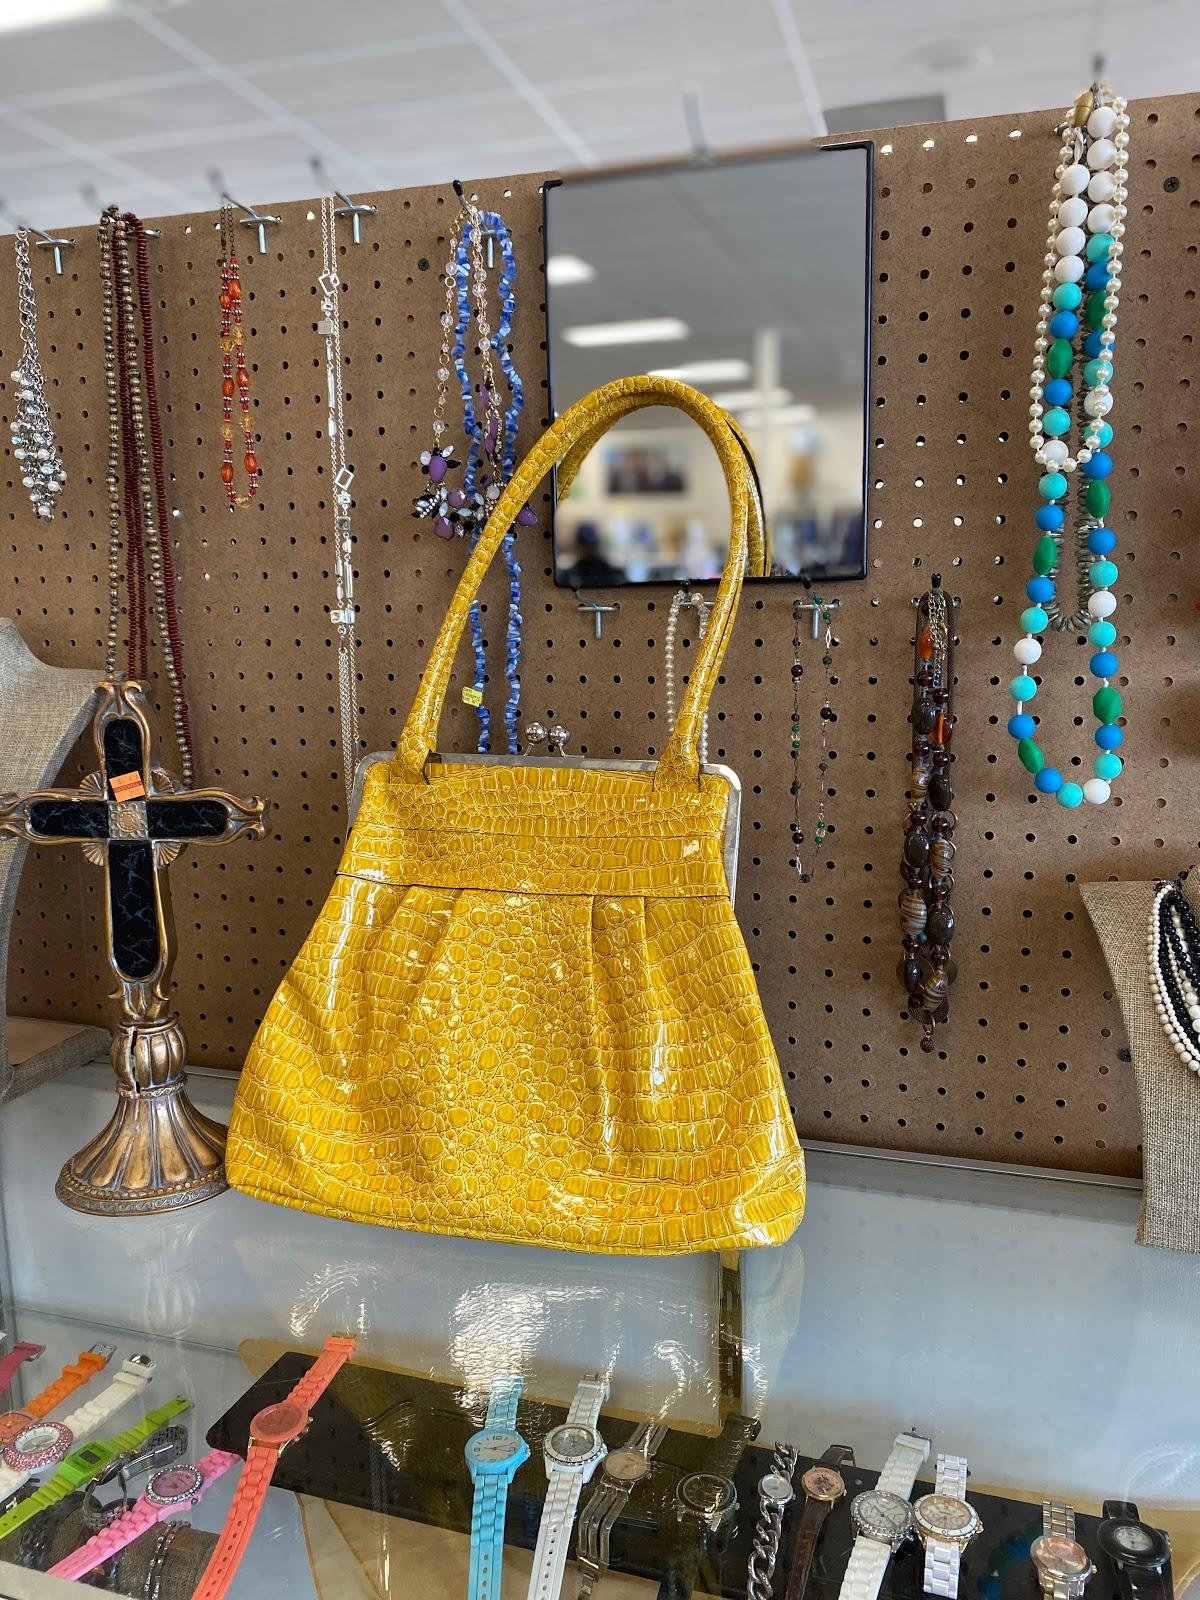 Yellow Thrifted Handbag Sitting On The Shelf At Goodwill